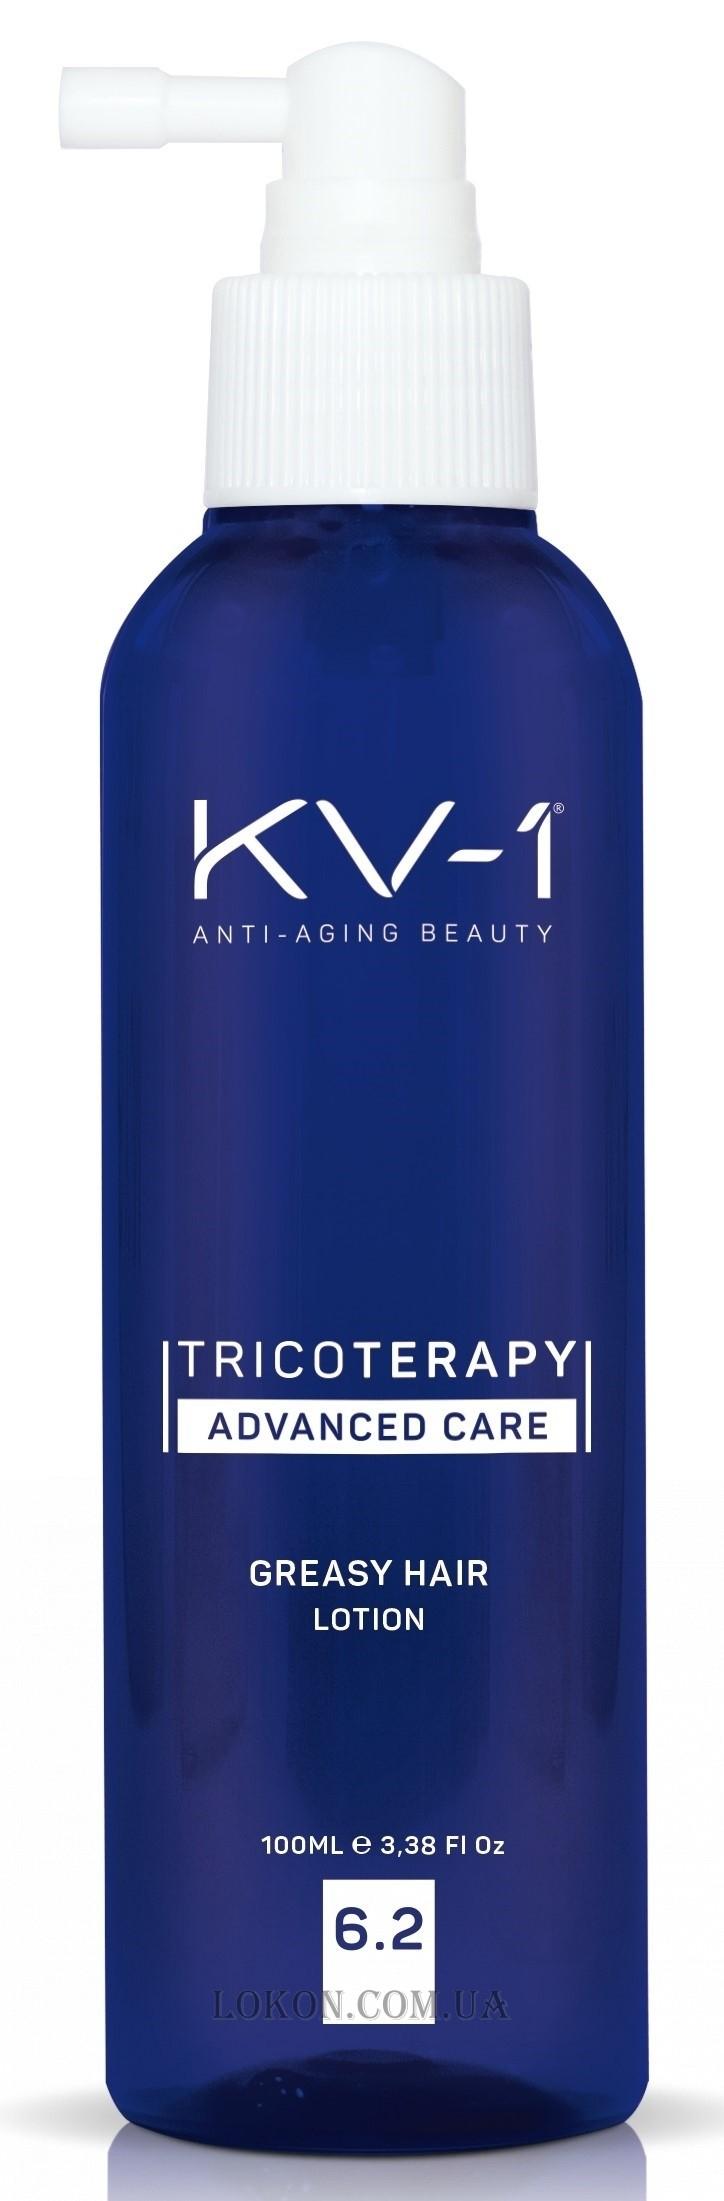 Лосьон против жирности кожи головы 6.2 Tricoterapy Greasy Hair Lotion KV-1 Испания 100 мл(р) — фото №1